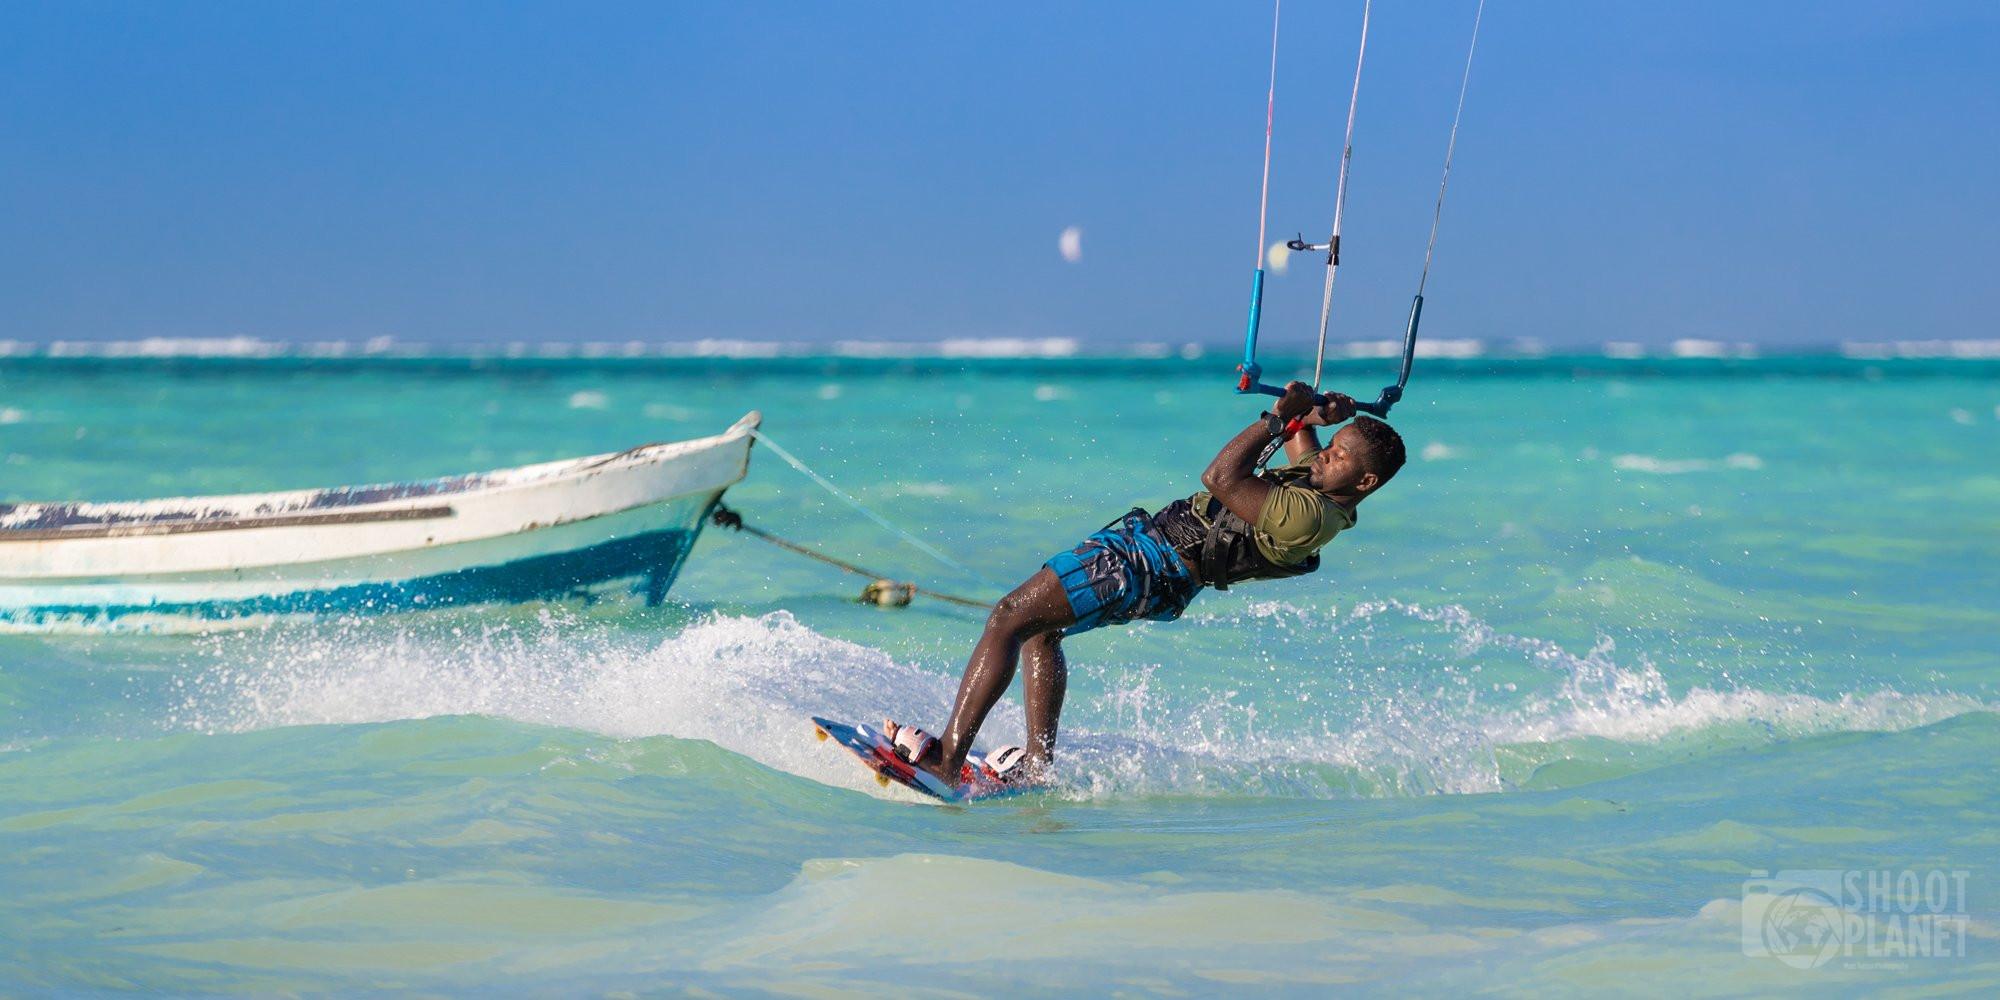 Kite surfers in Paje beach, Zanzibar Tanzania